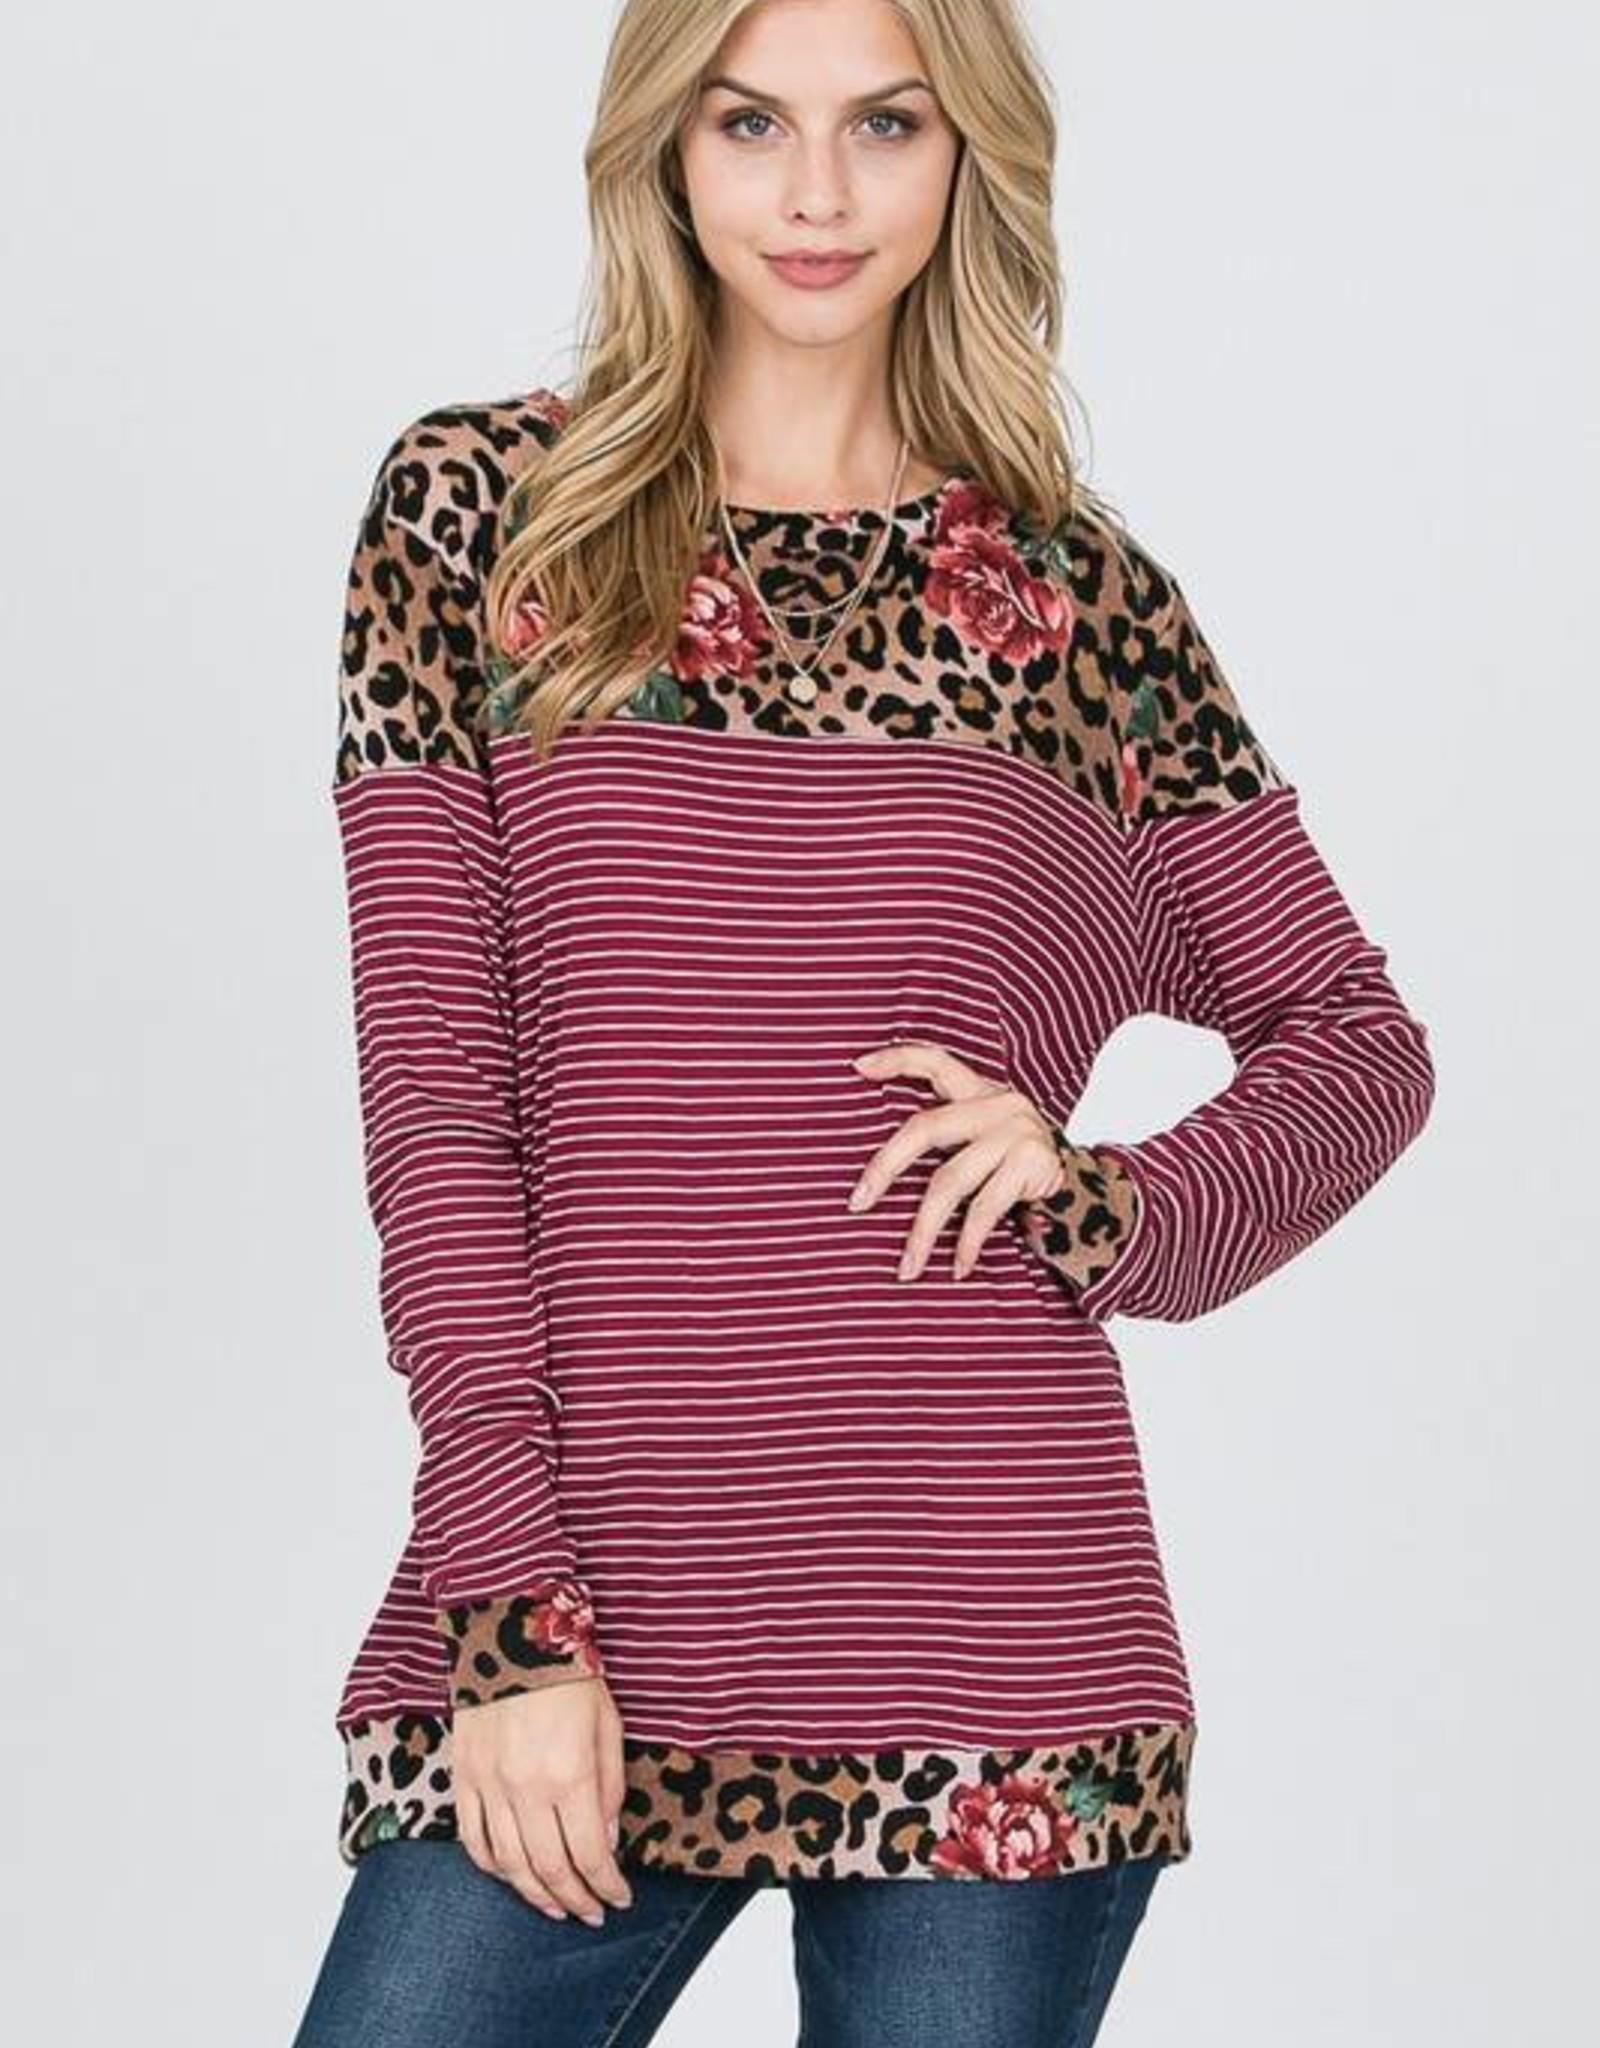 Floral Leopard LS Striped Top